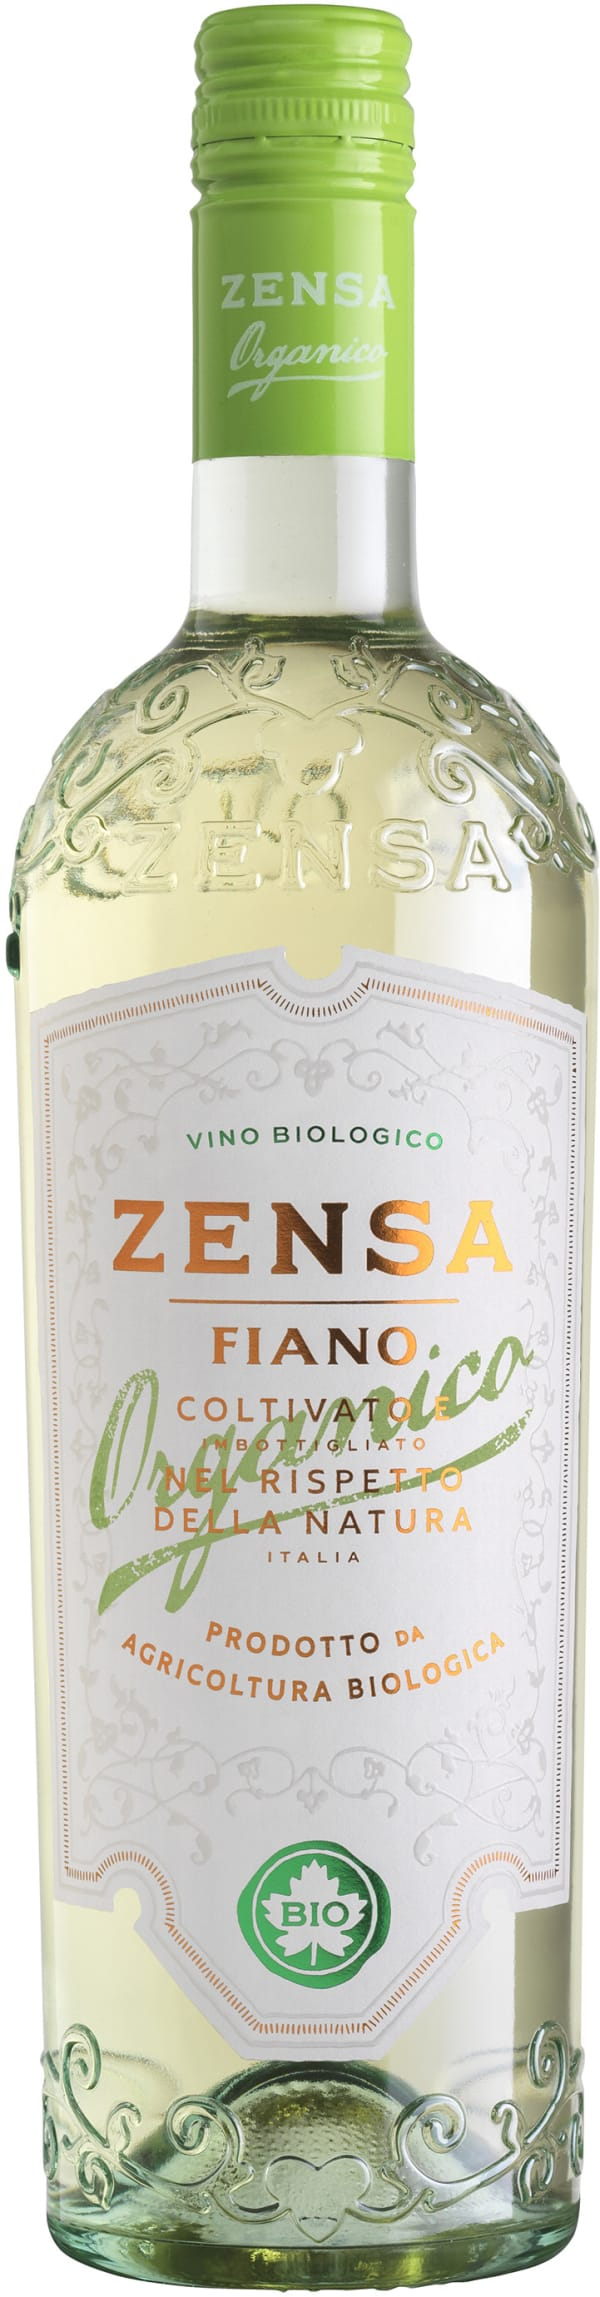 Zensa Fiano Organico 2016